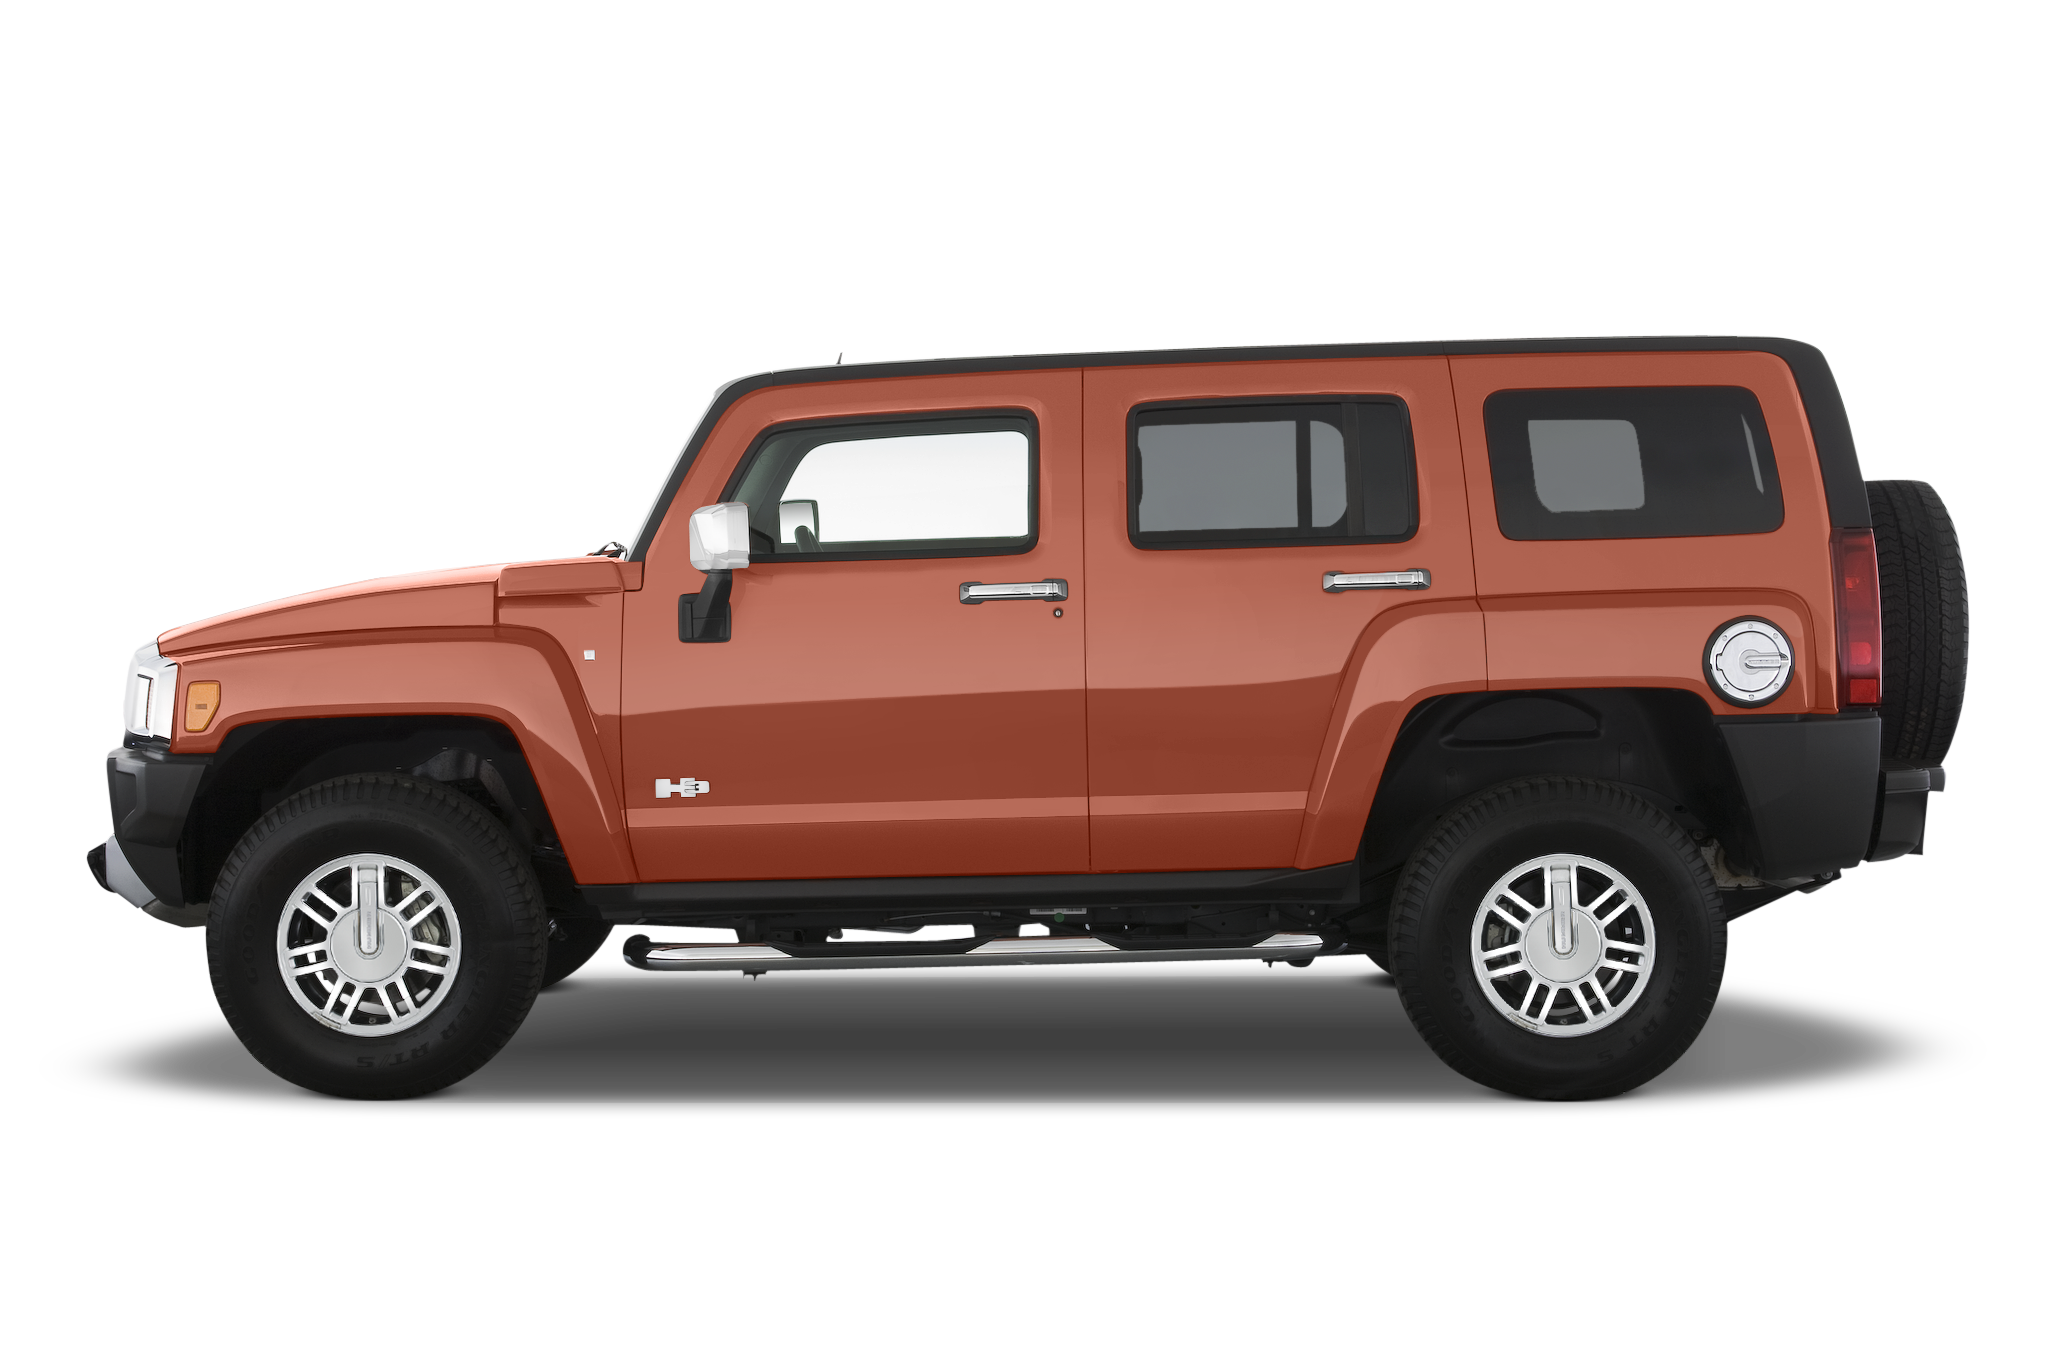 Hummer H3 Reviews - 2018 - 2019 New Car Reviews by ...